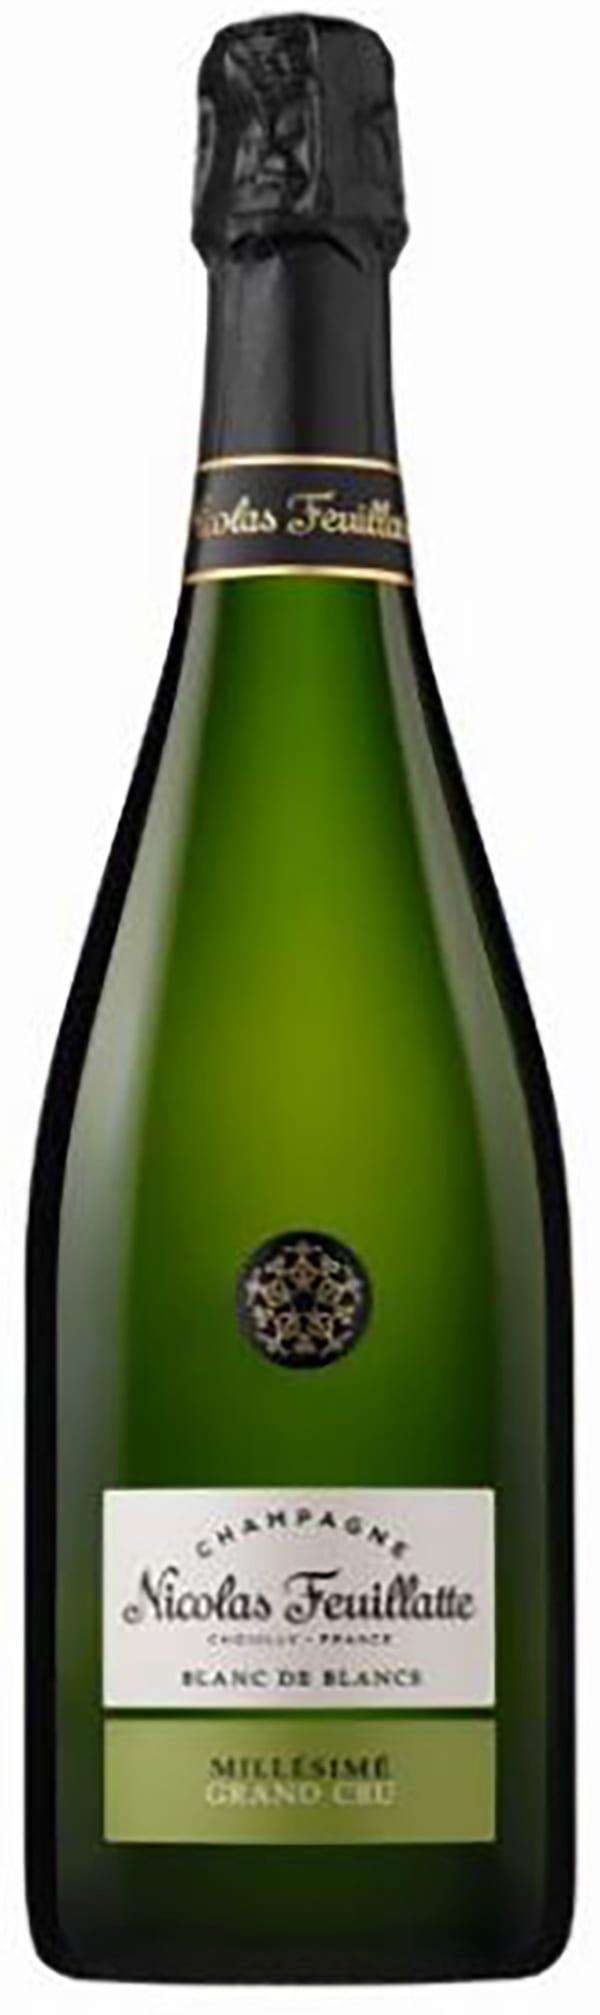 Nicolas Feuillatte Grand Cru Blanc de Blancs Champagne Brut 2006